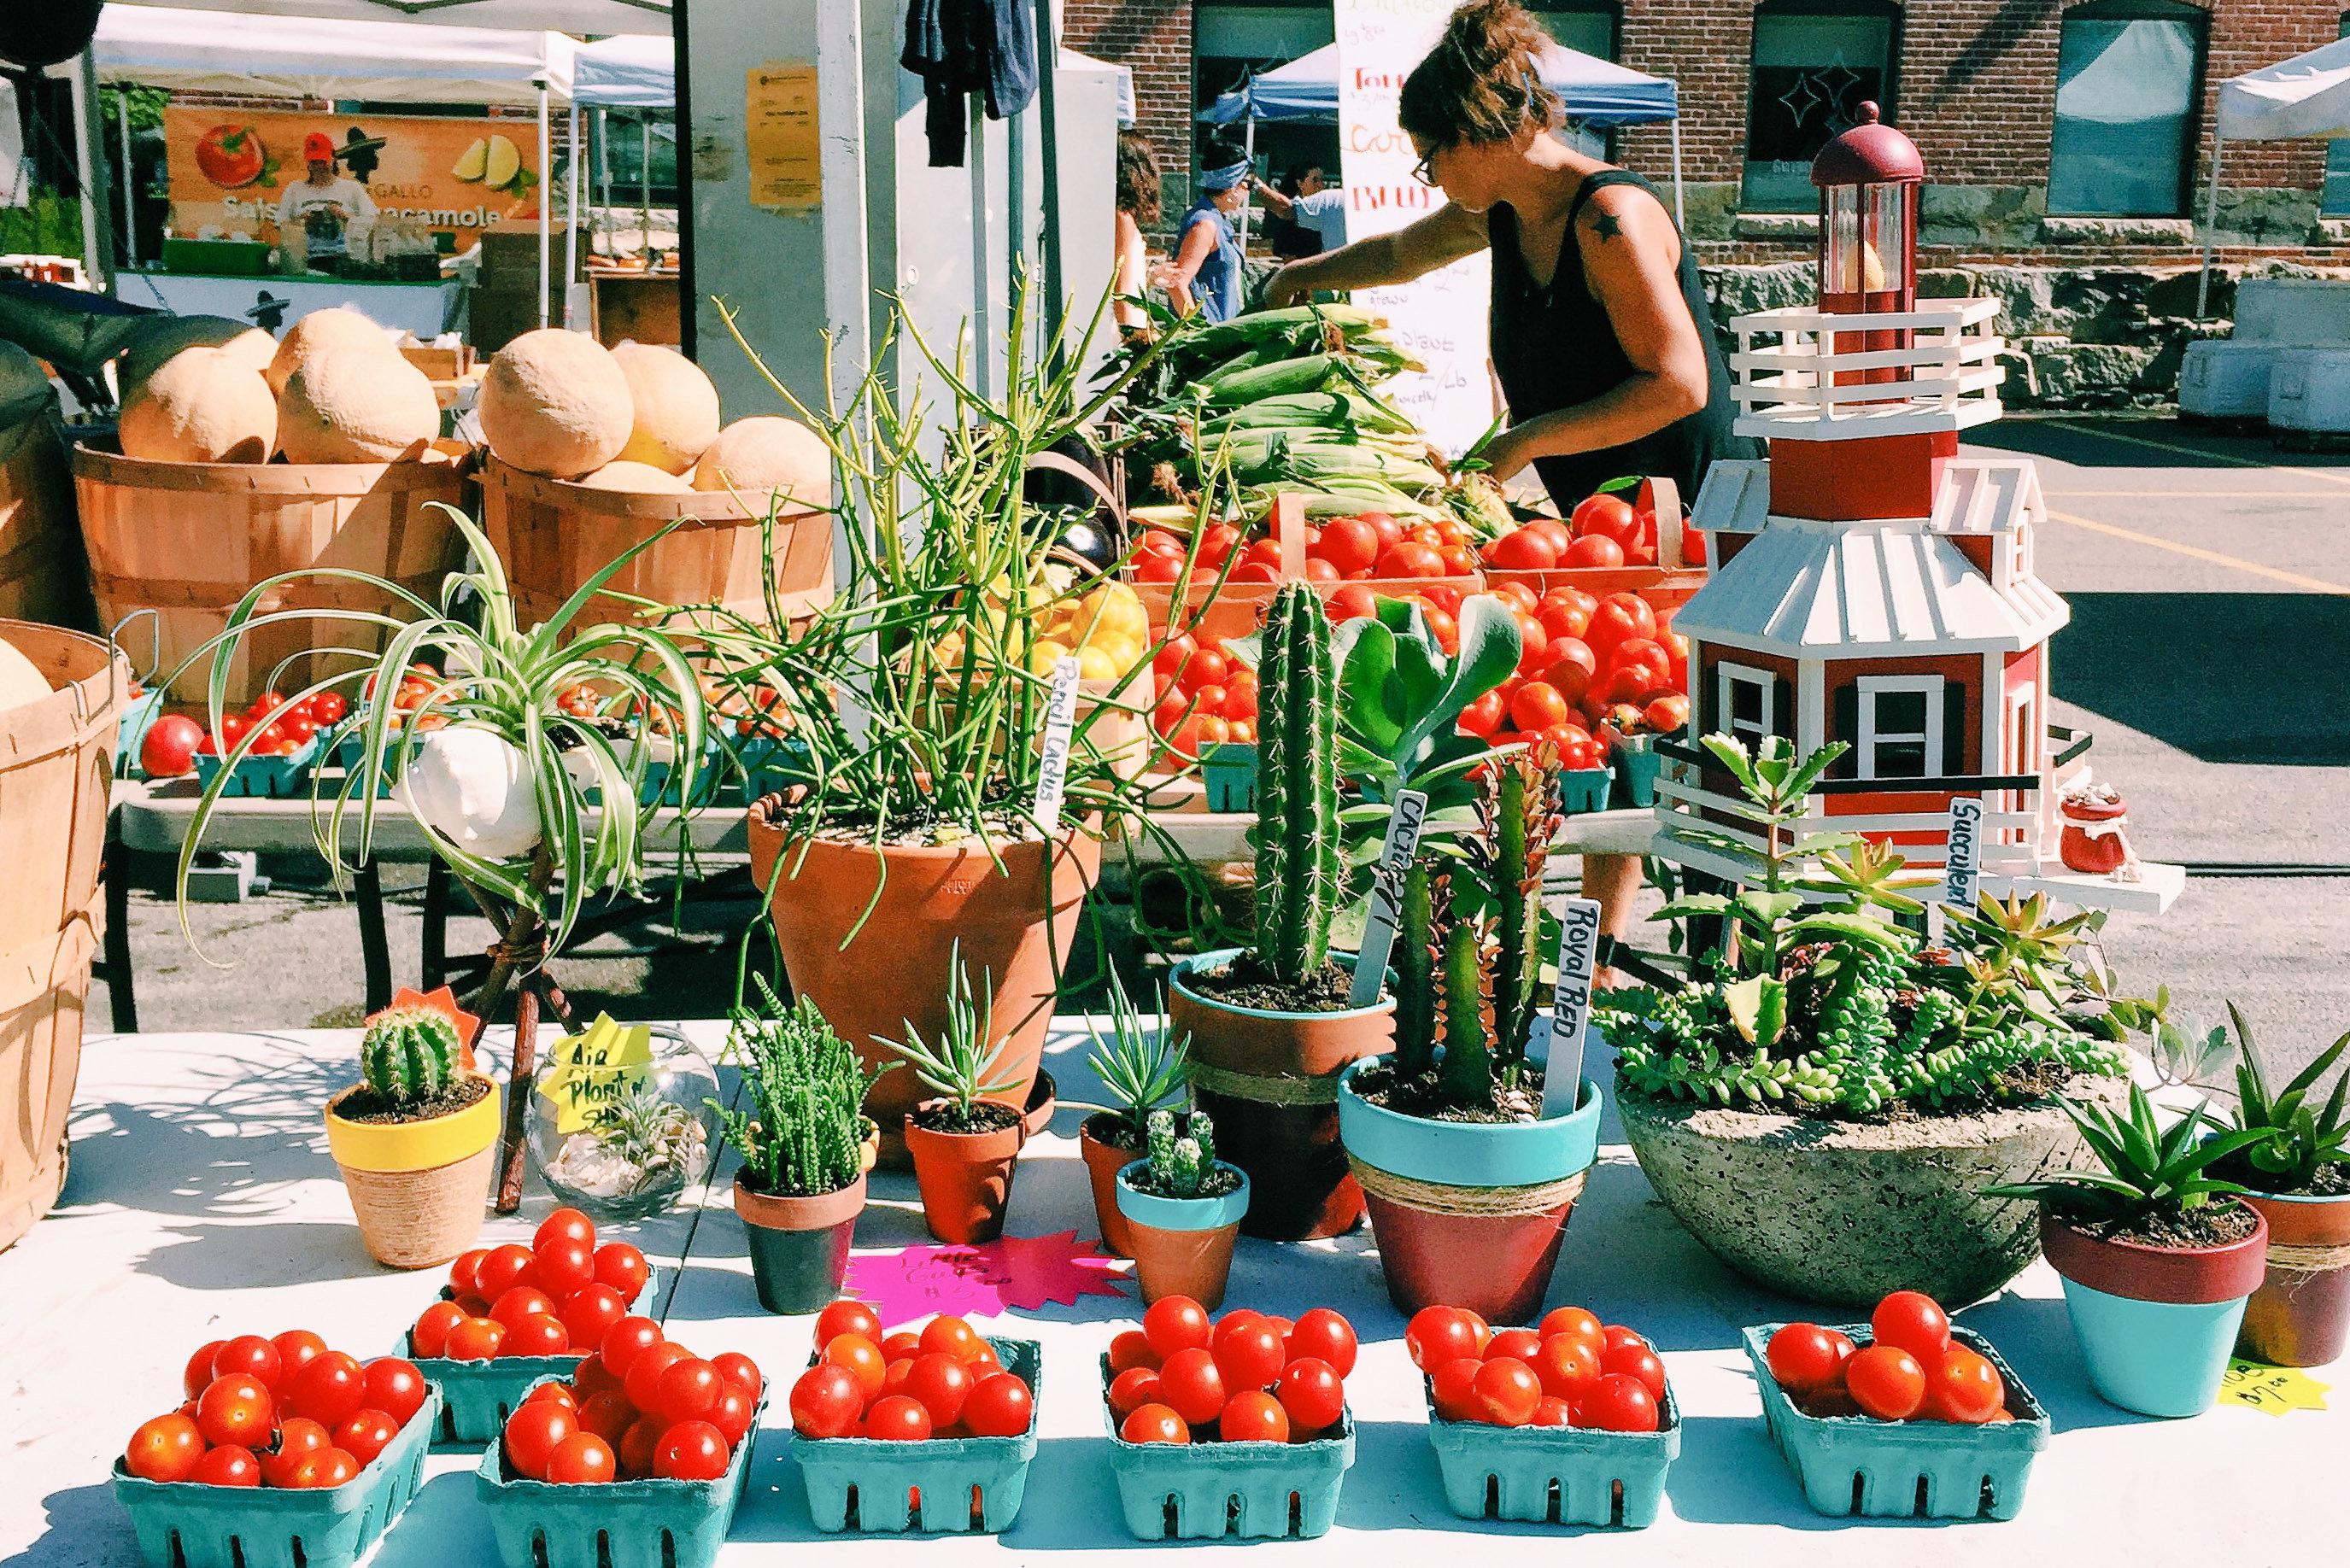 Trip Ideas outdoor local food produce plant marketplace floristry flower market vegetable flowering plant vendor greengrocer food natural foods flowerpot fruit stall whole food floral design fresh